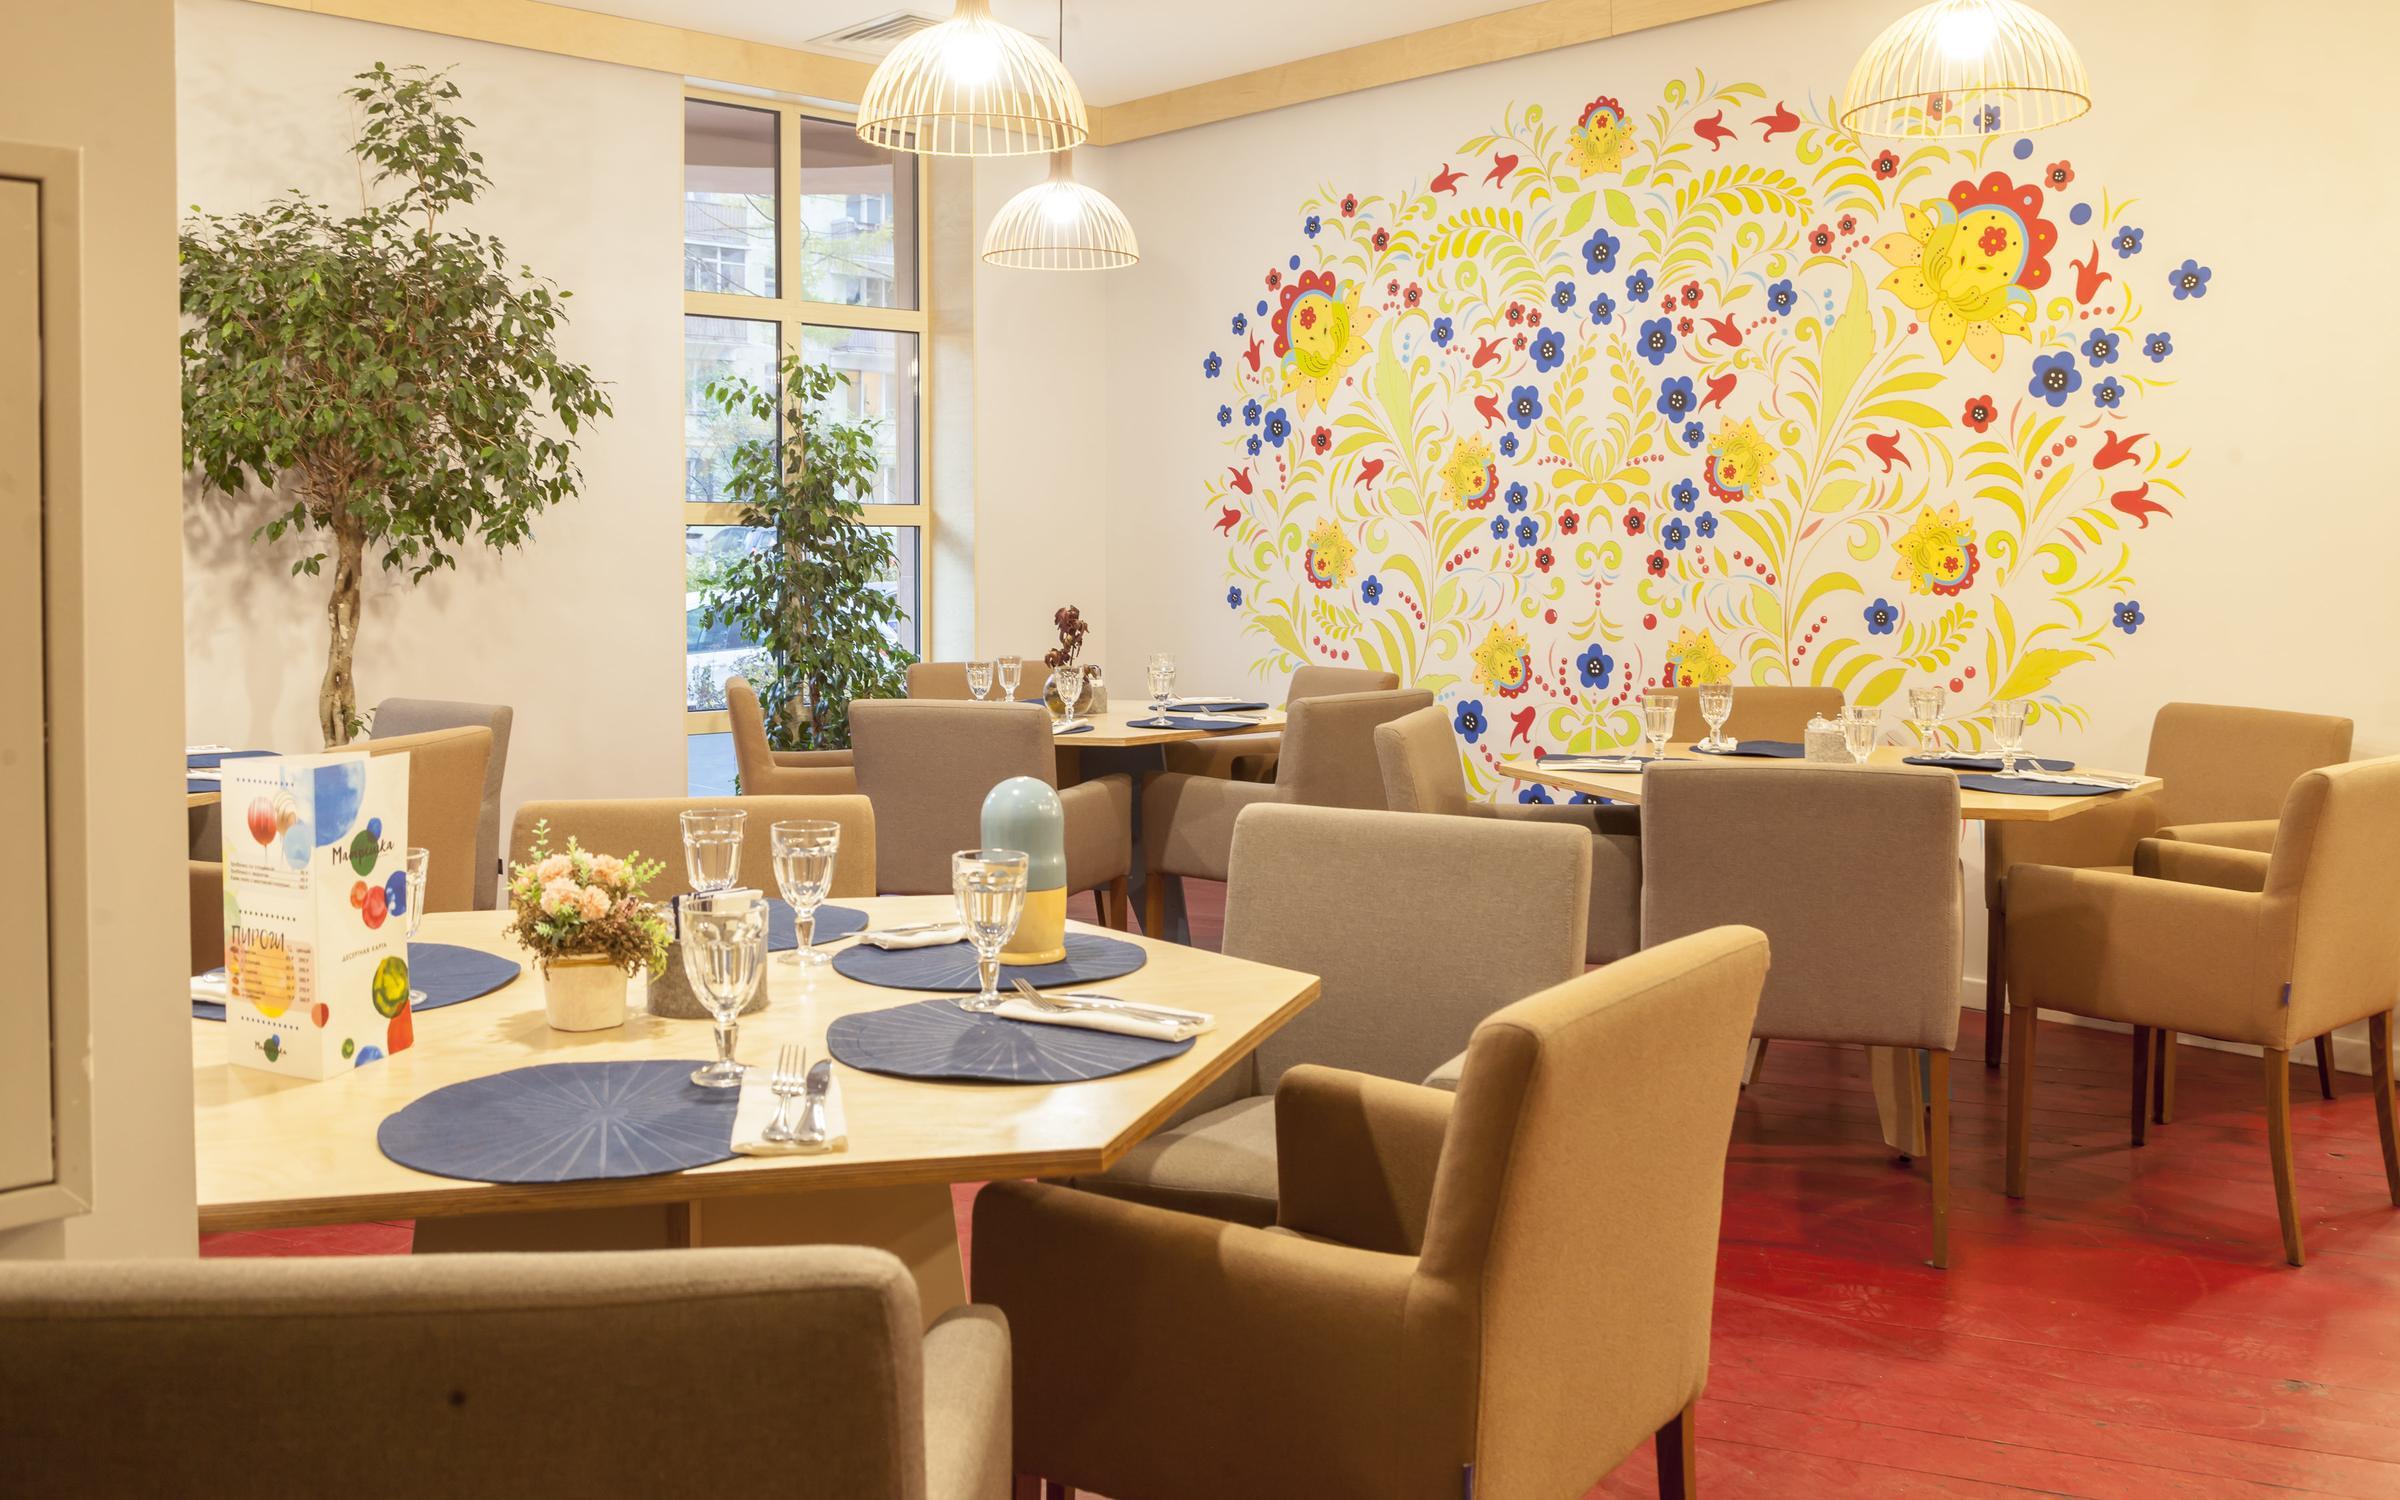 фотография Семейного ресторана Матрёшка на улице Обручева